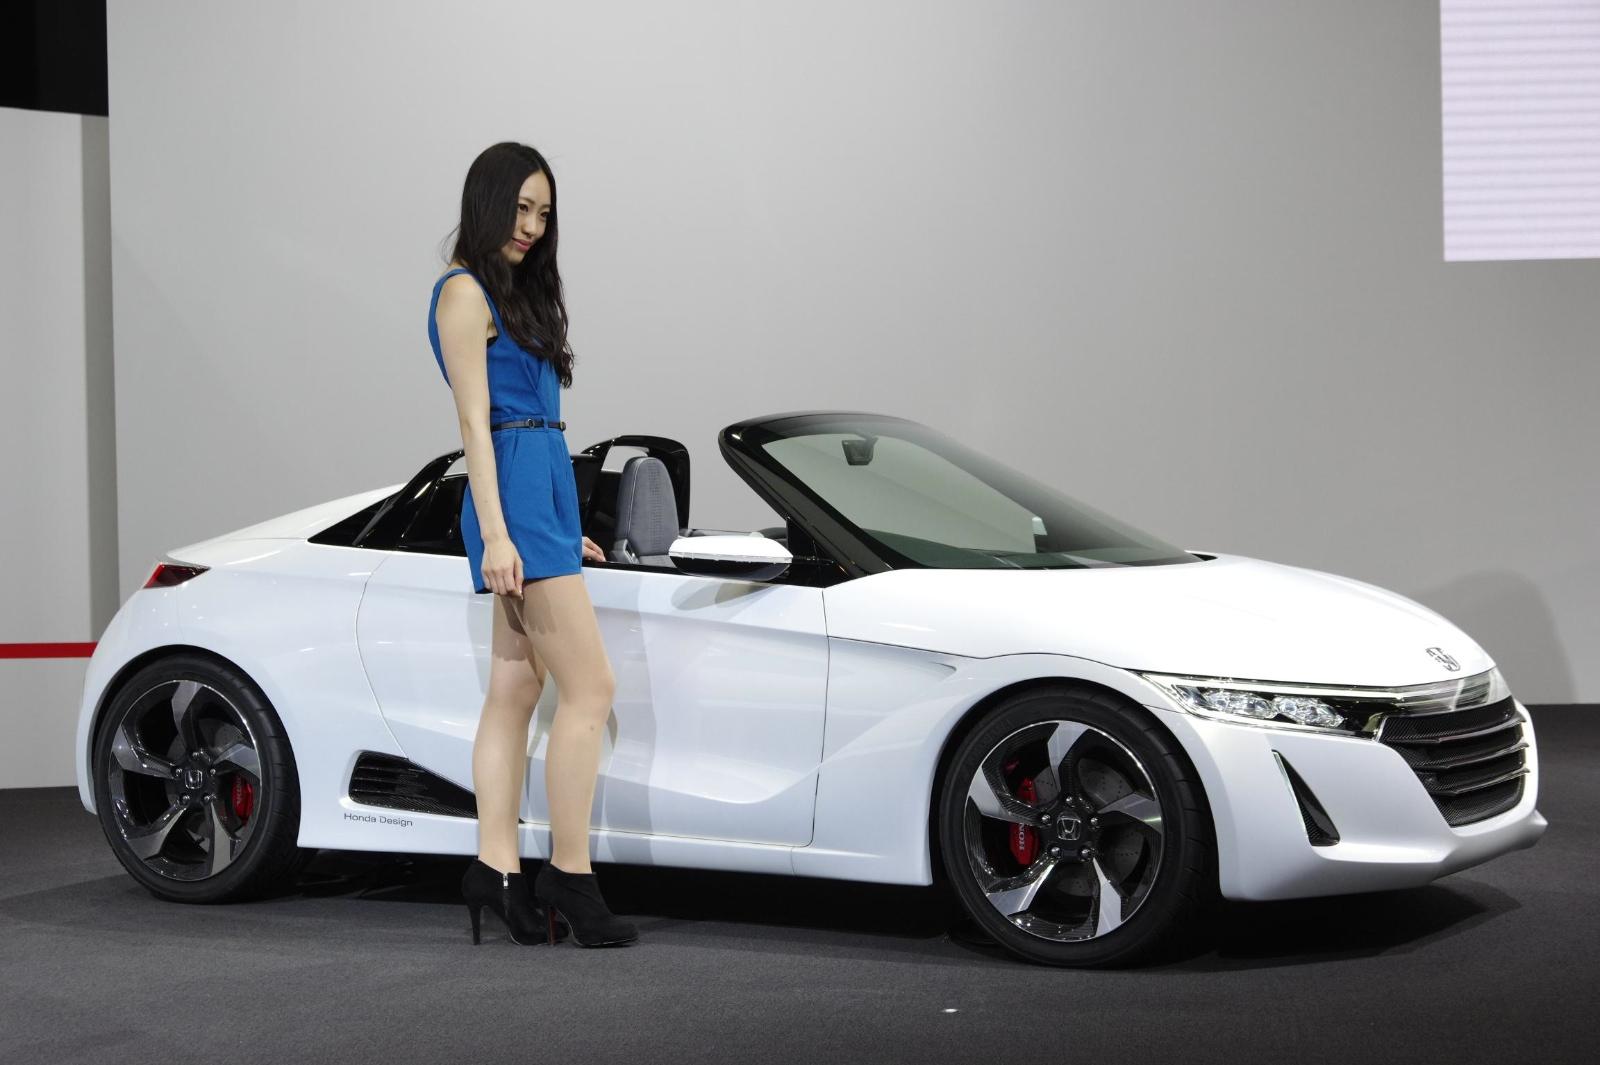 Shrunken NSX: Honda S660 Kei Sportscar Coming in 2015 ...